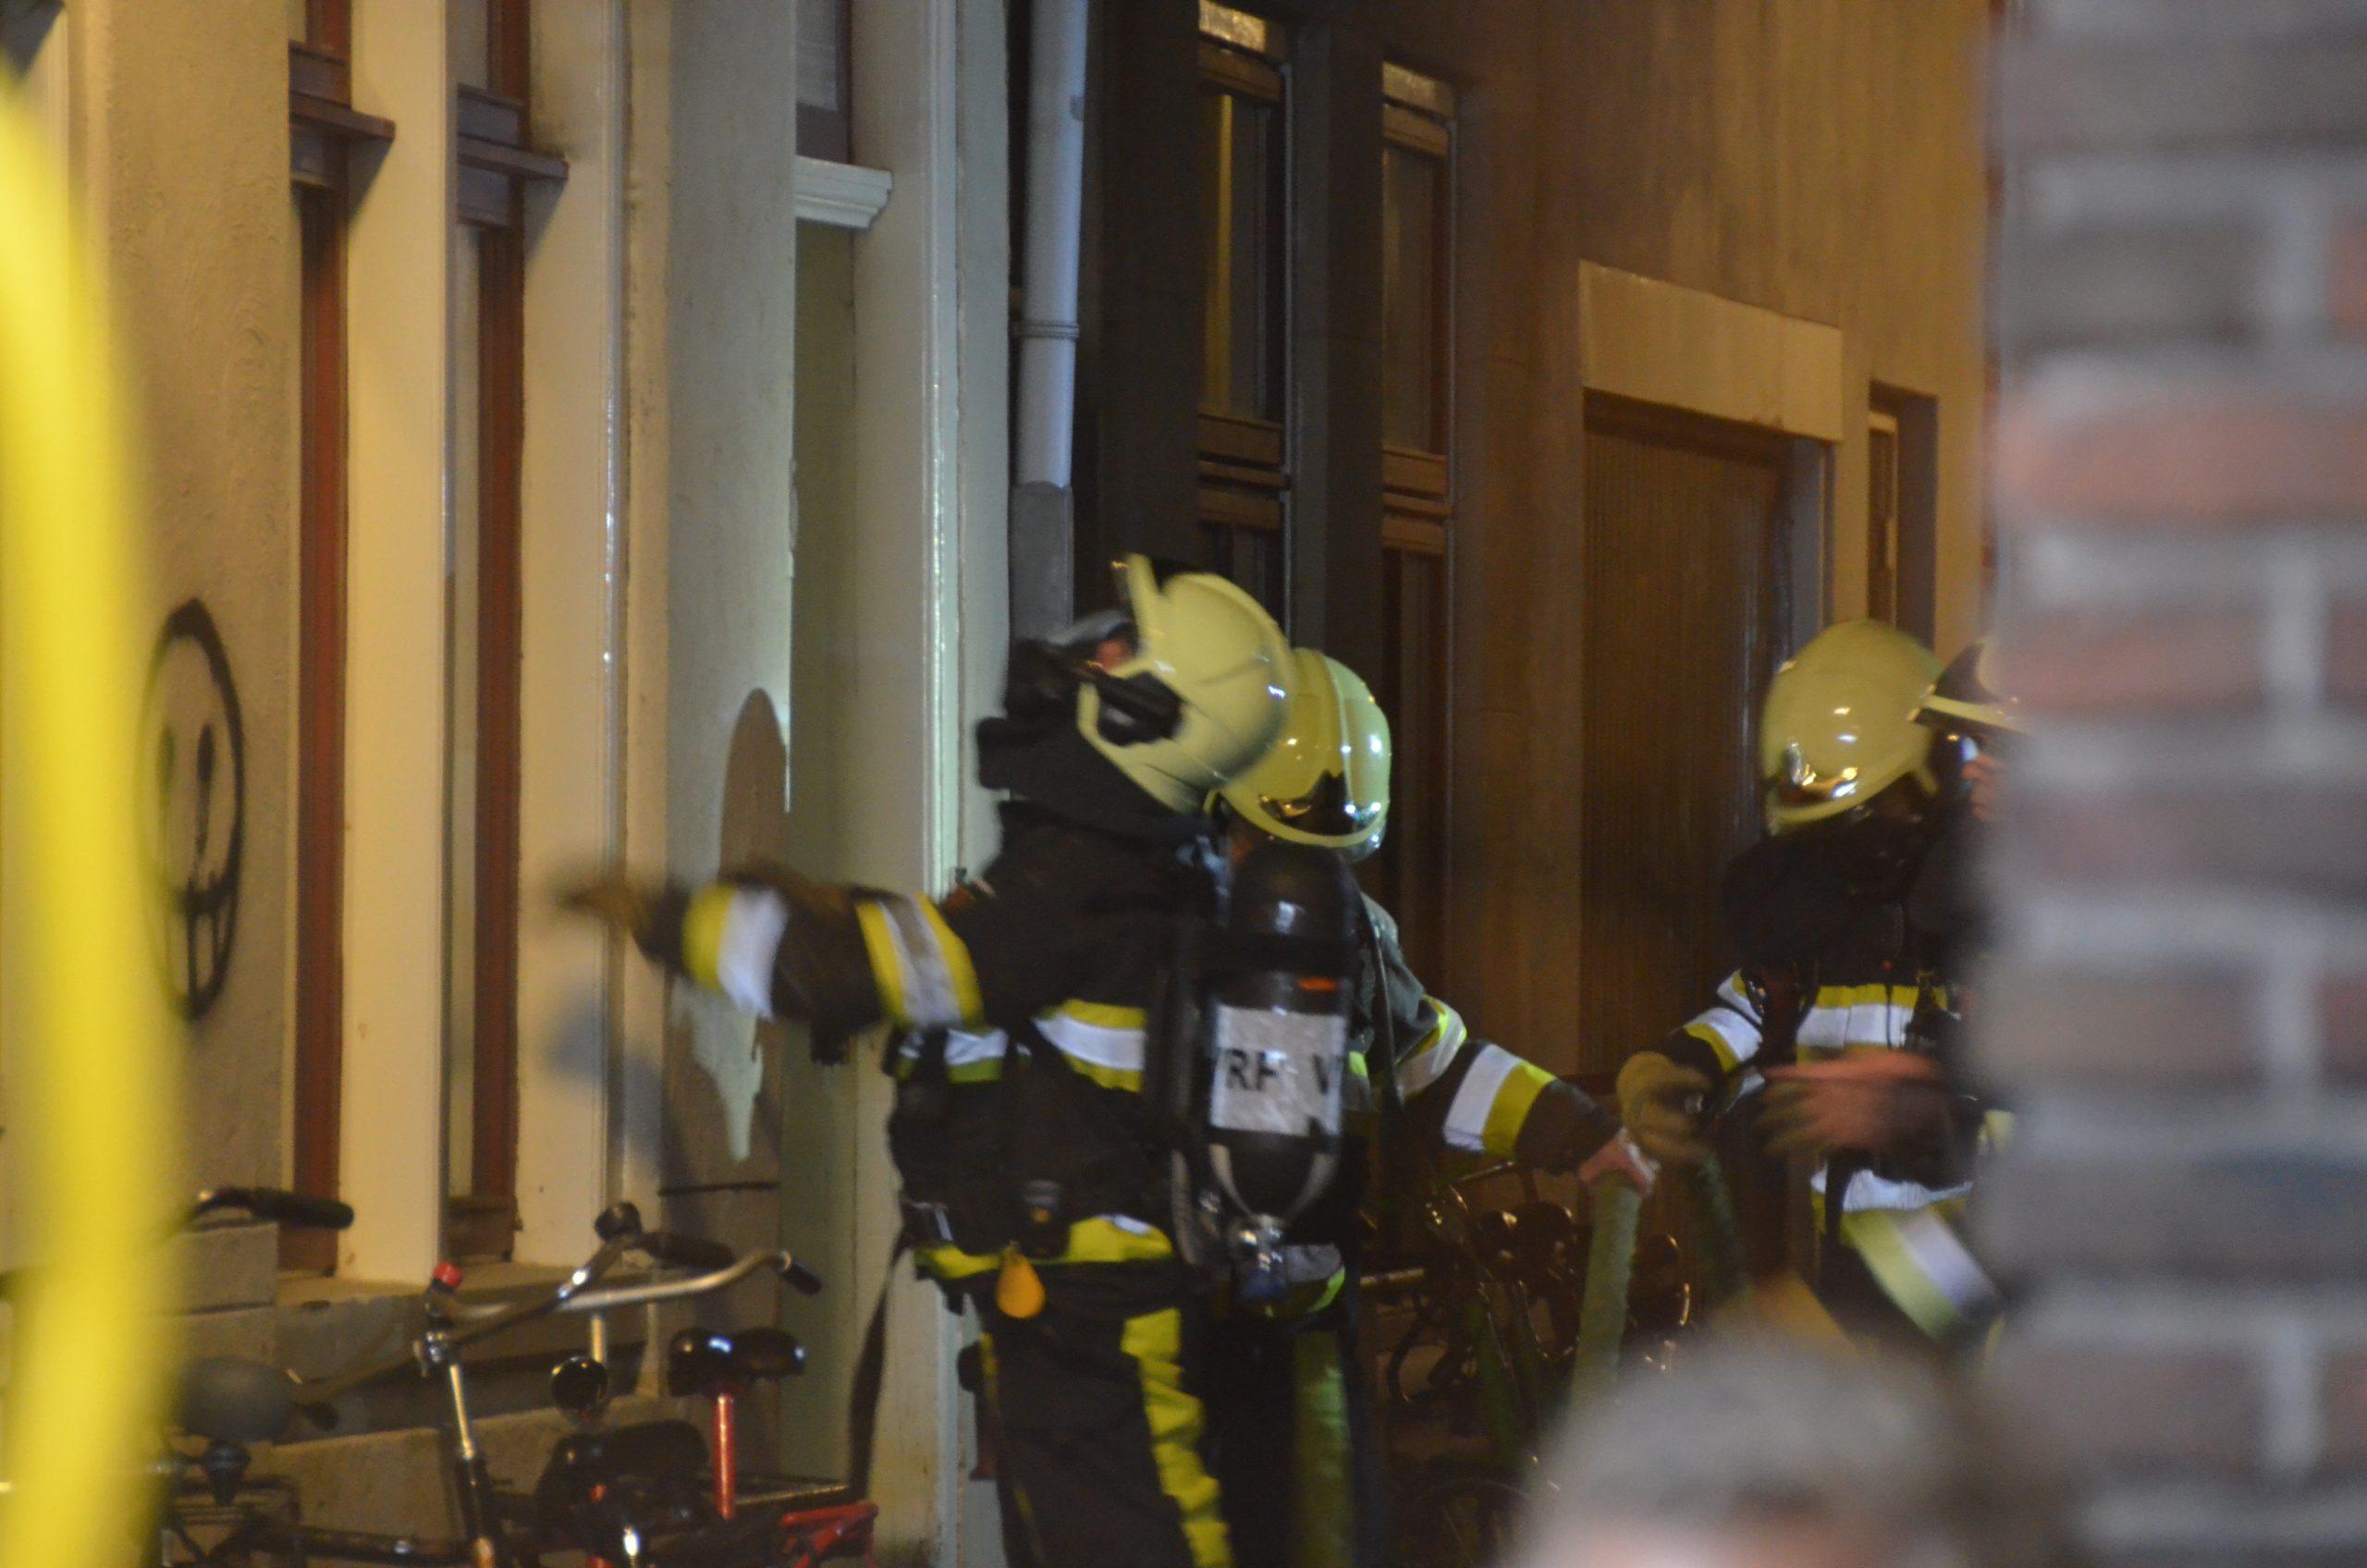 Flinke rookontwikkeling na brand in een studentenhuis in Leeuwarden